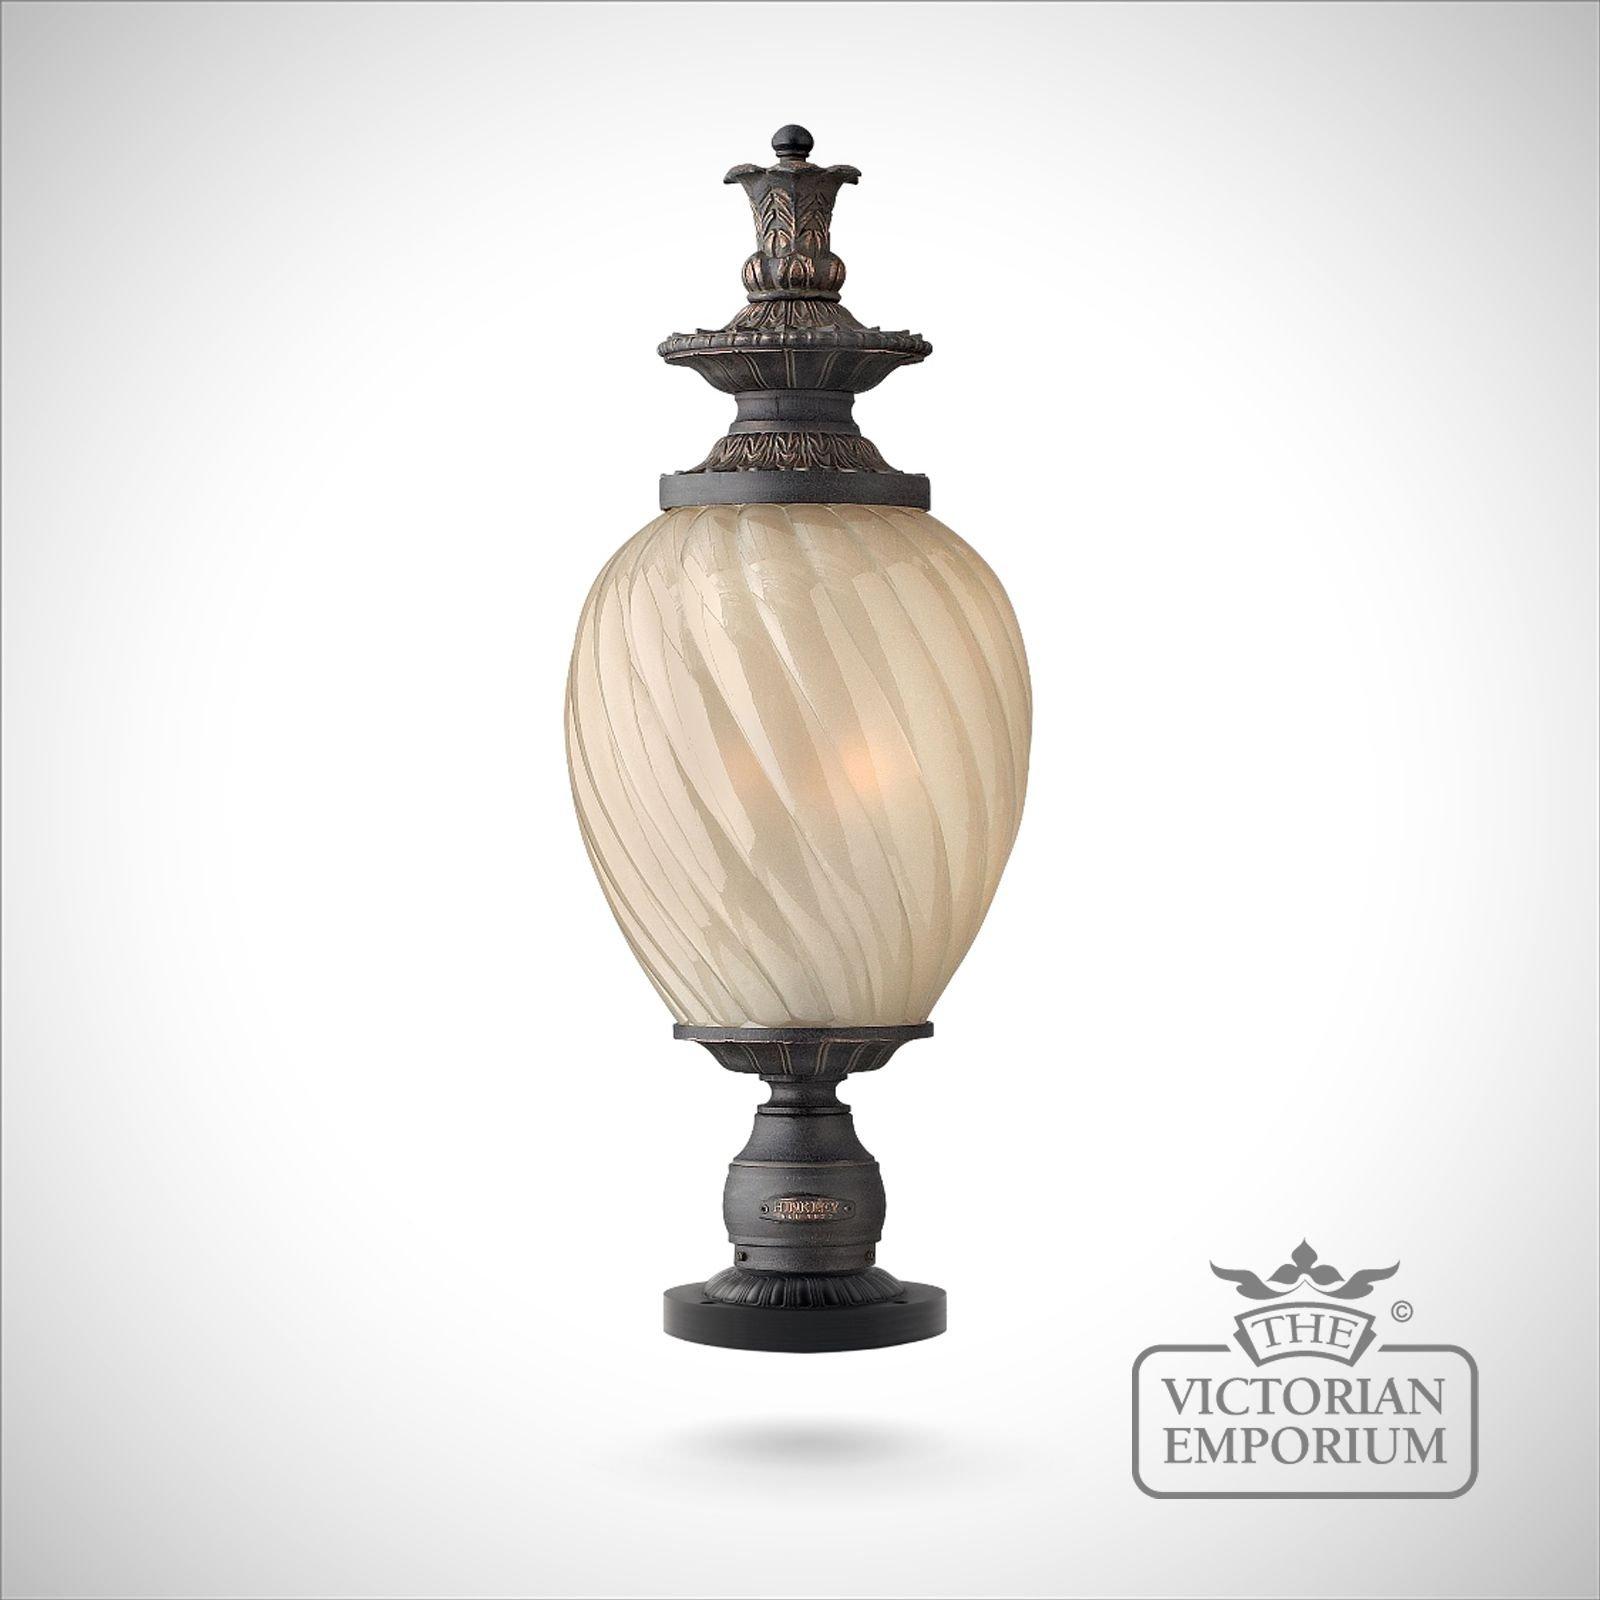 Hinkley Montreal Pedestal Light: Montreal Pedestal Lantern